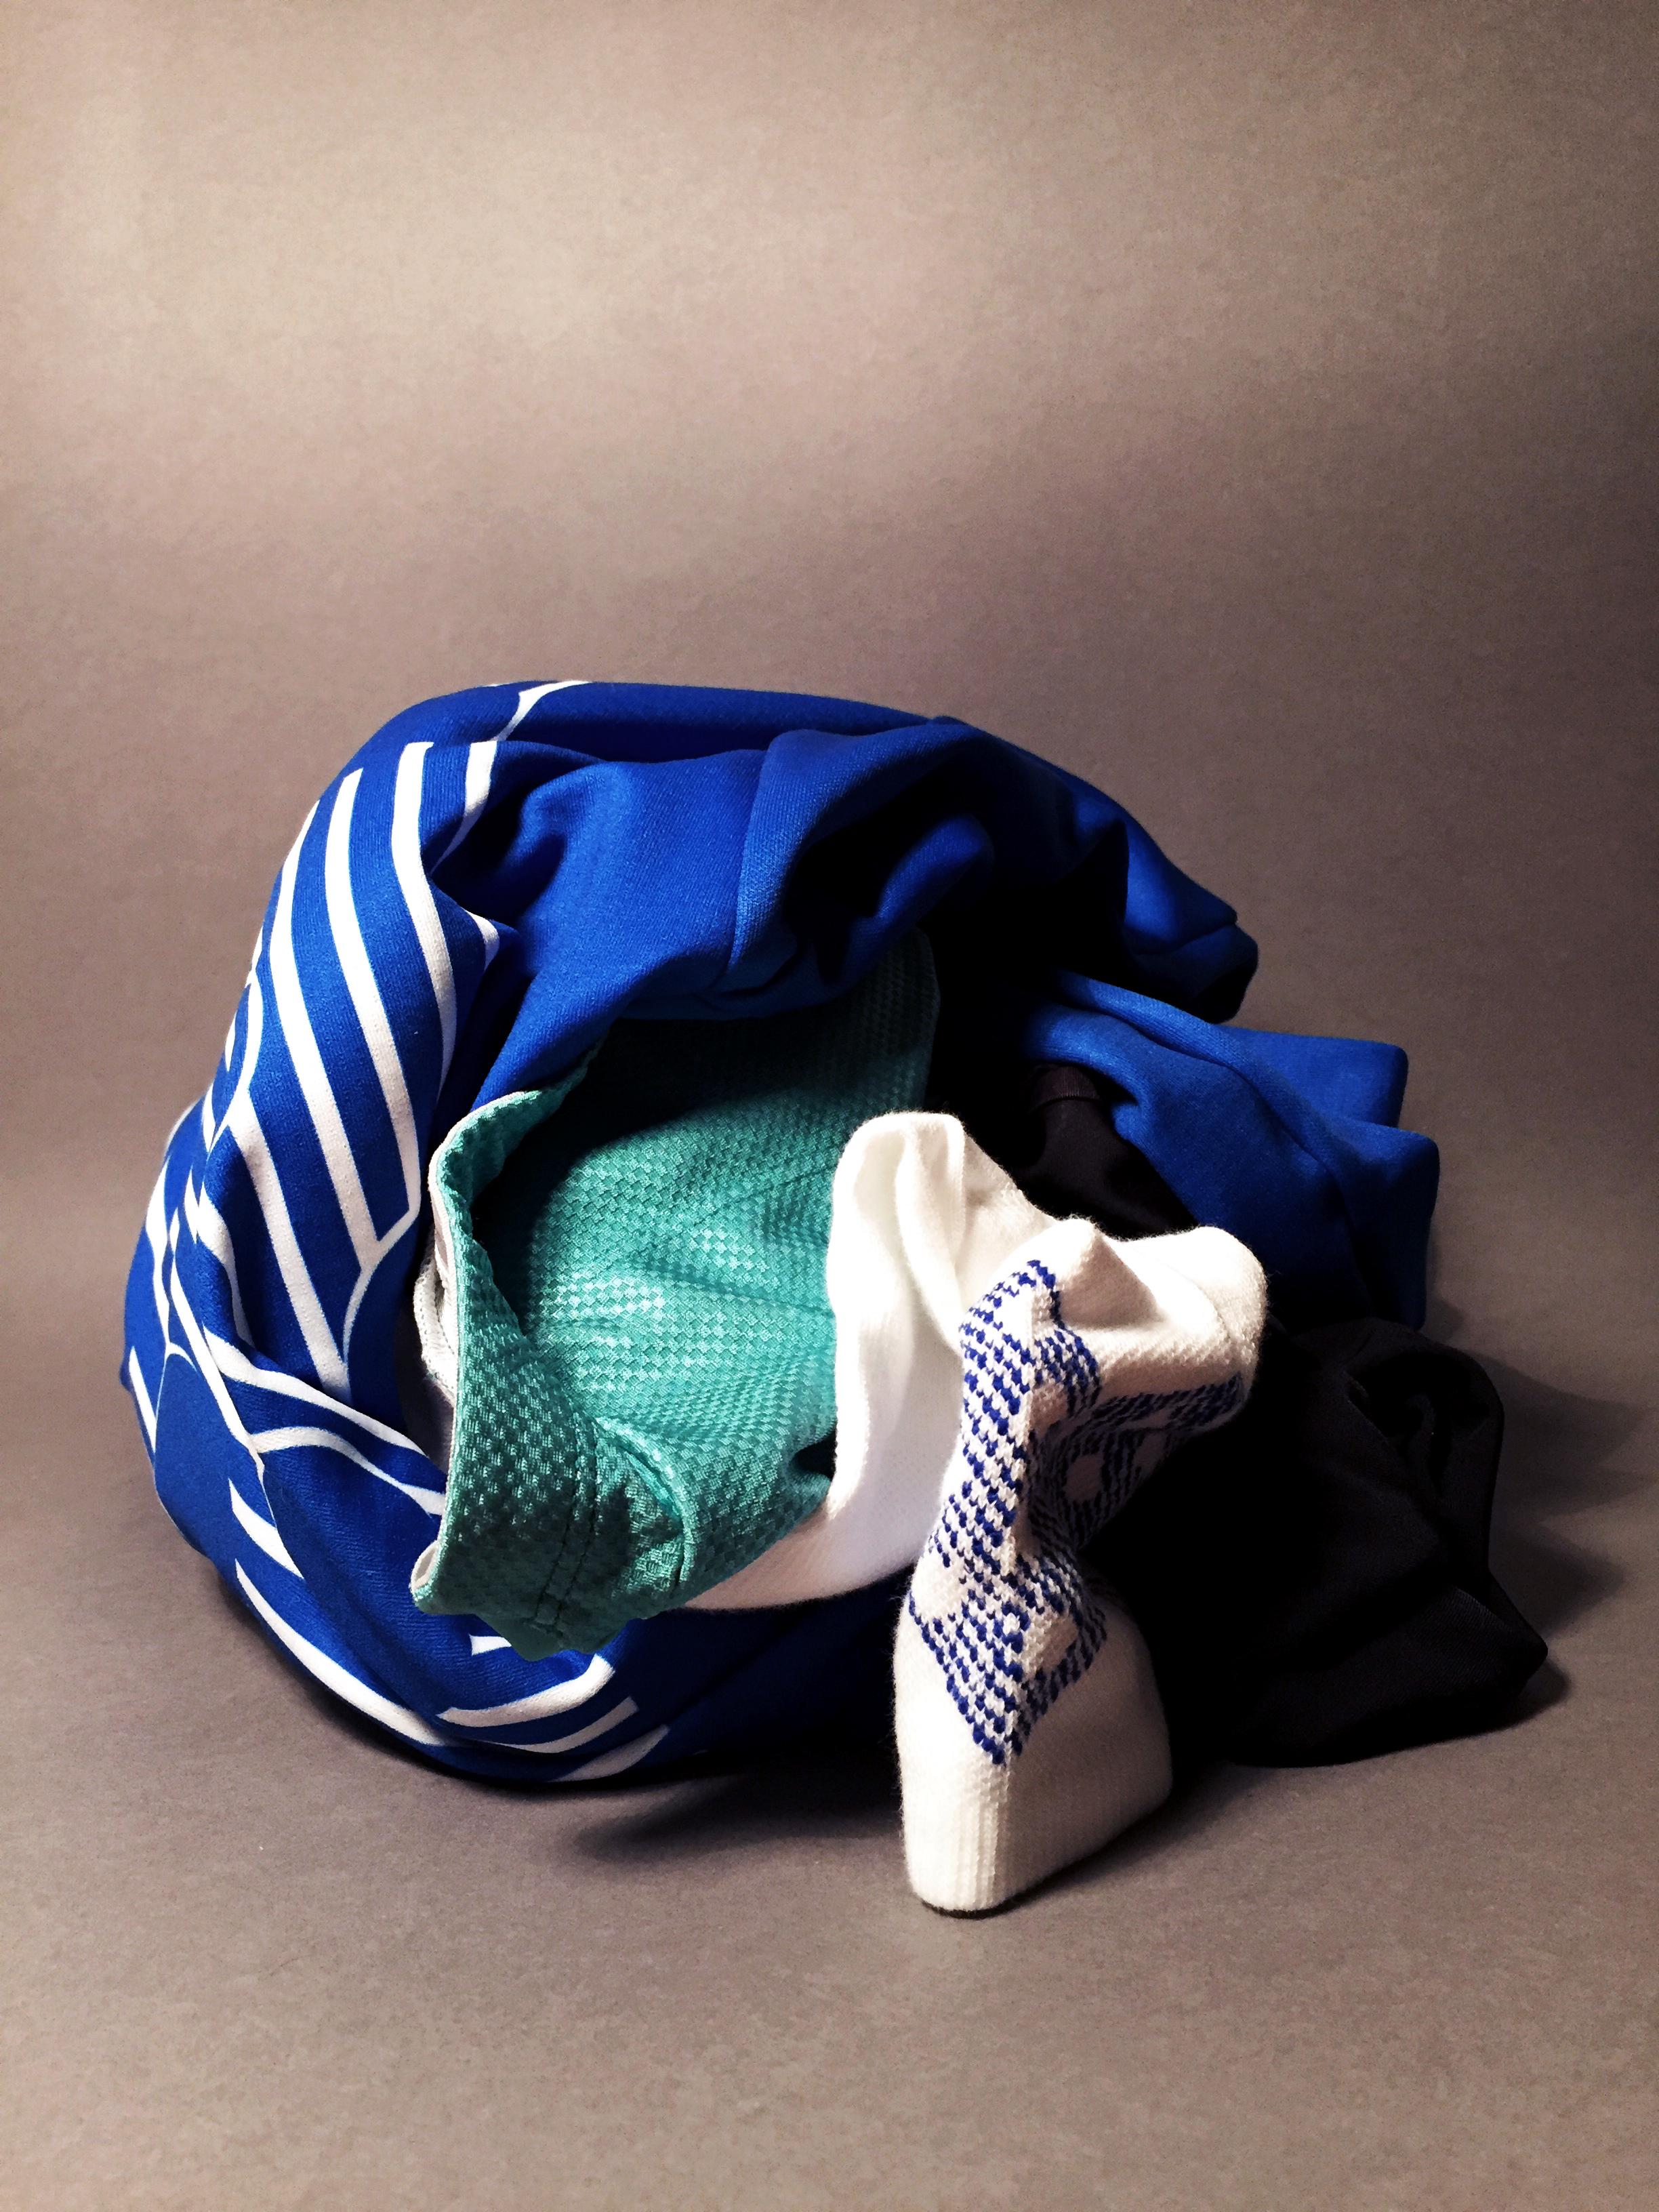 ls puncheur jersey, ss crest jersey, classic bib tights,  puncheur socks